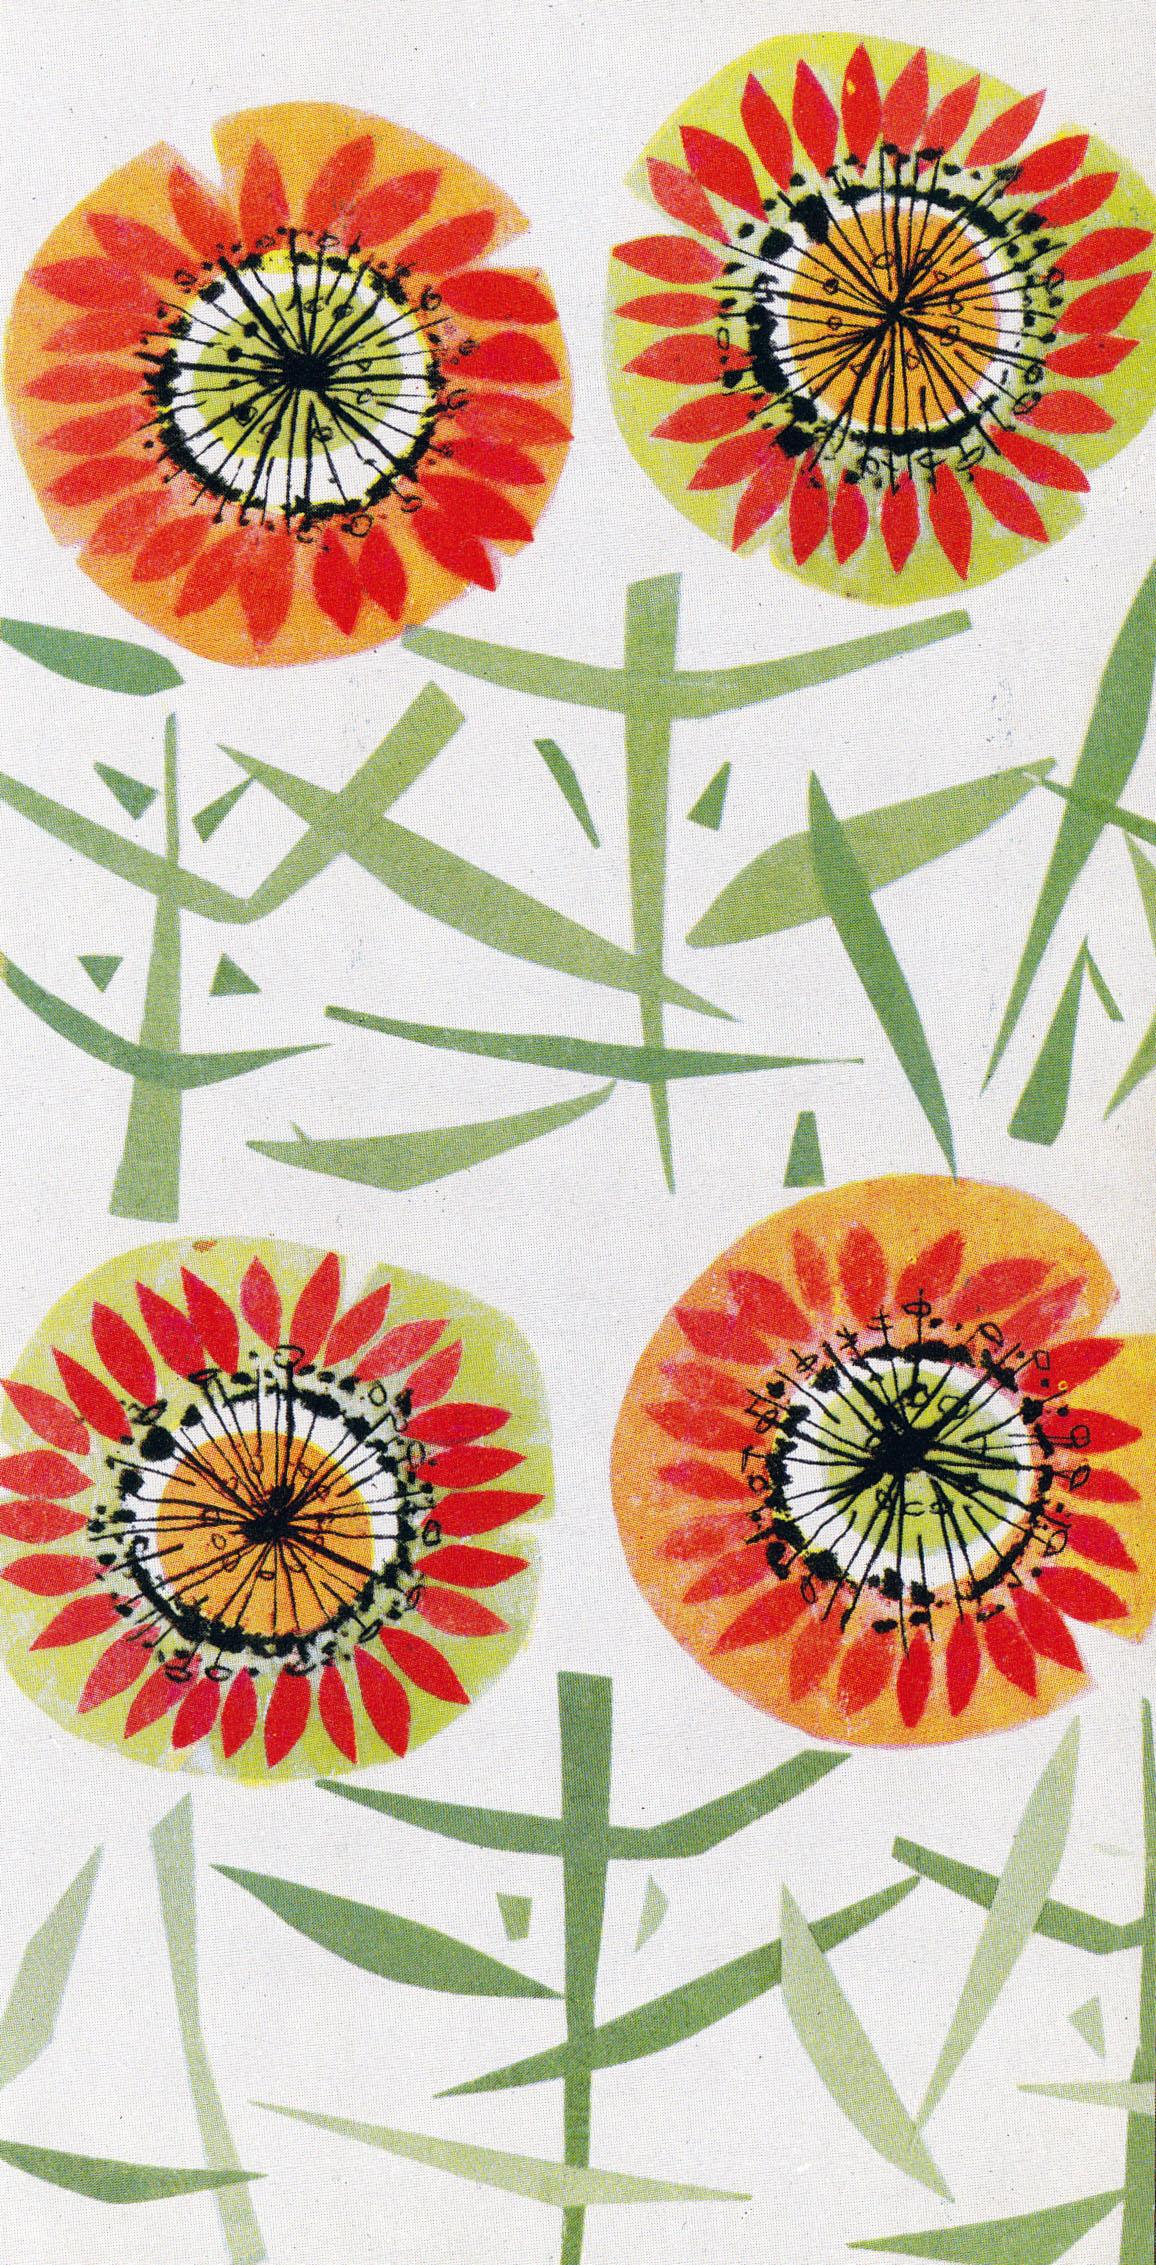 affefadecffbde-nature-pattern-pattern-floral-wallpaper-wp5802360